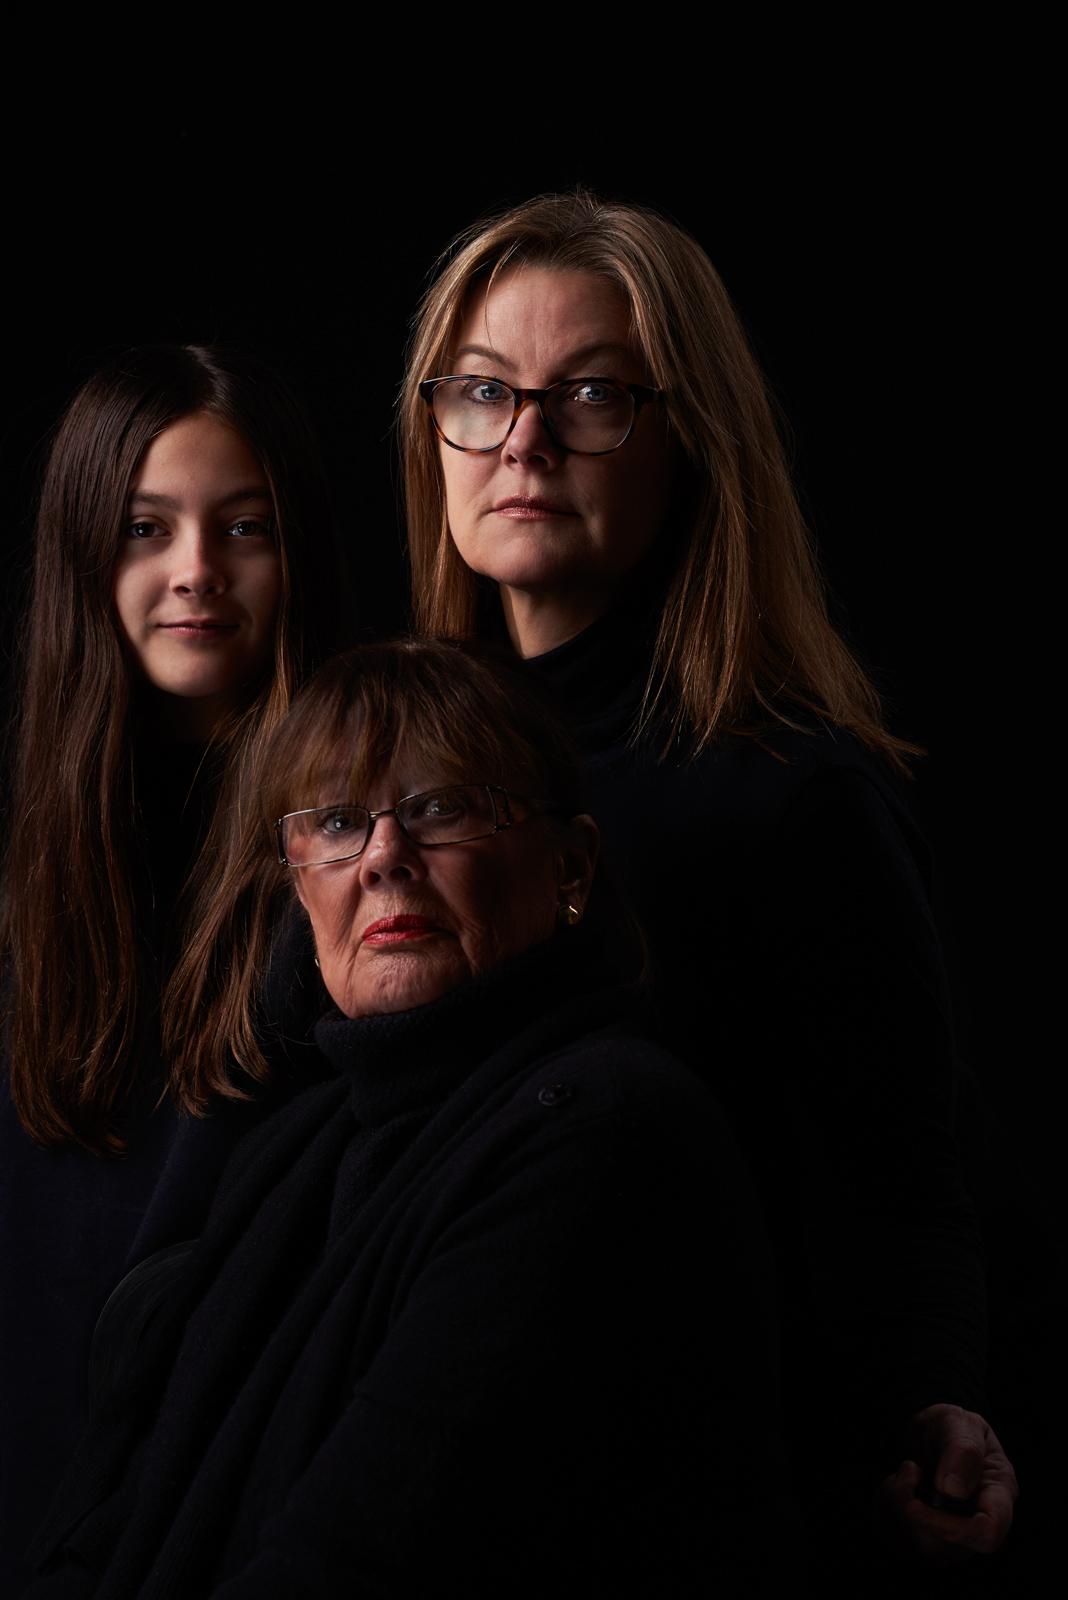 3 generations, self portrait, Gabriella, Cecilia, Gittan, 2018